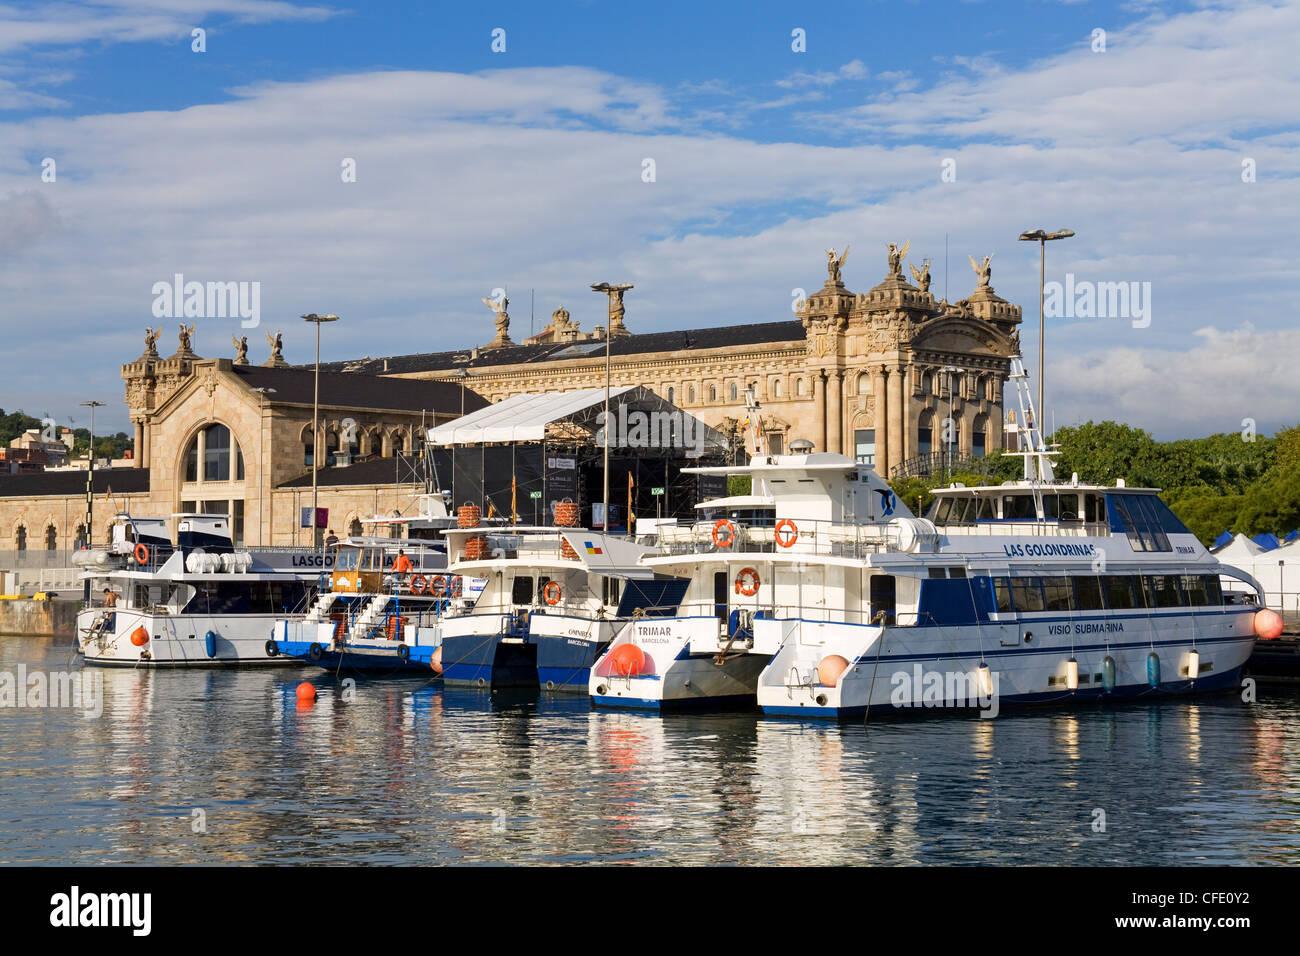 Aduana,in Port Vell, Barcelona, Catalonia, Spain, Europe - Stock Image